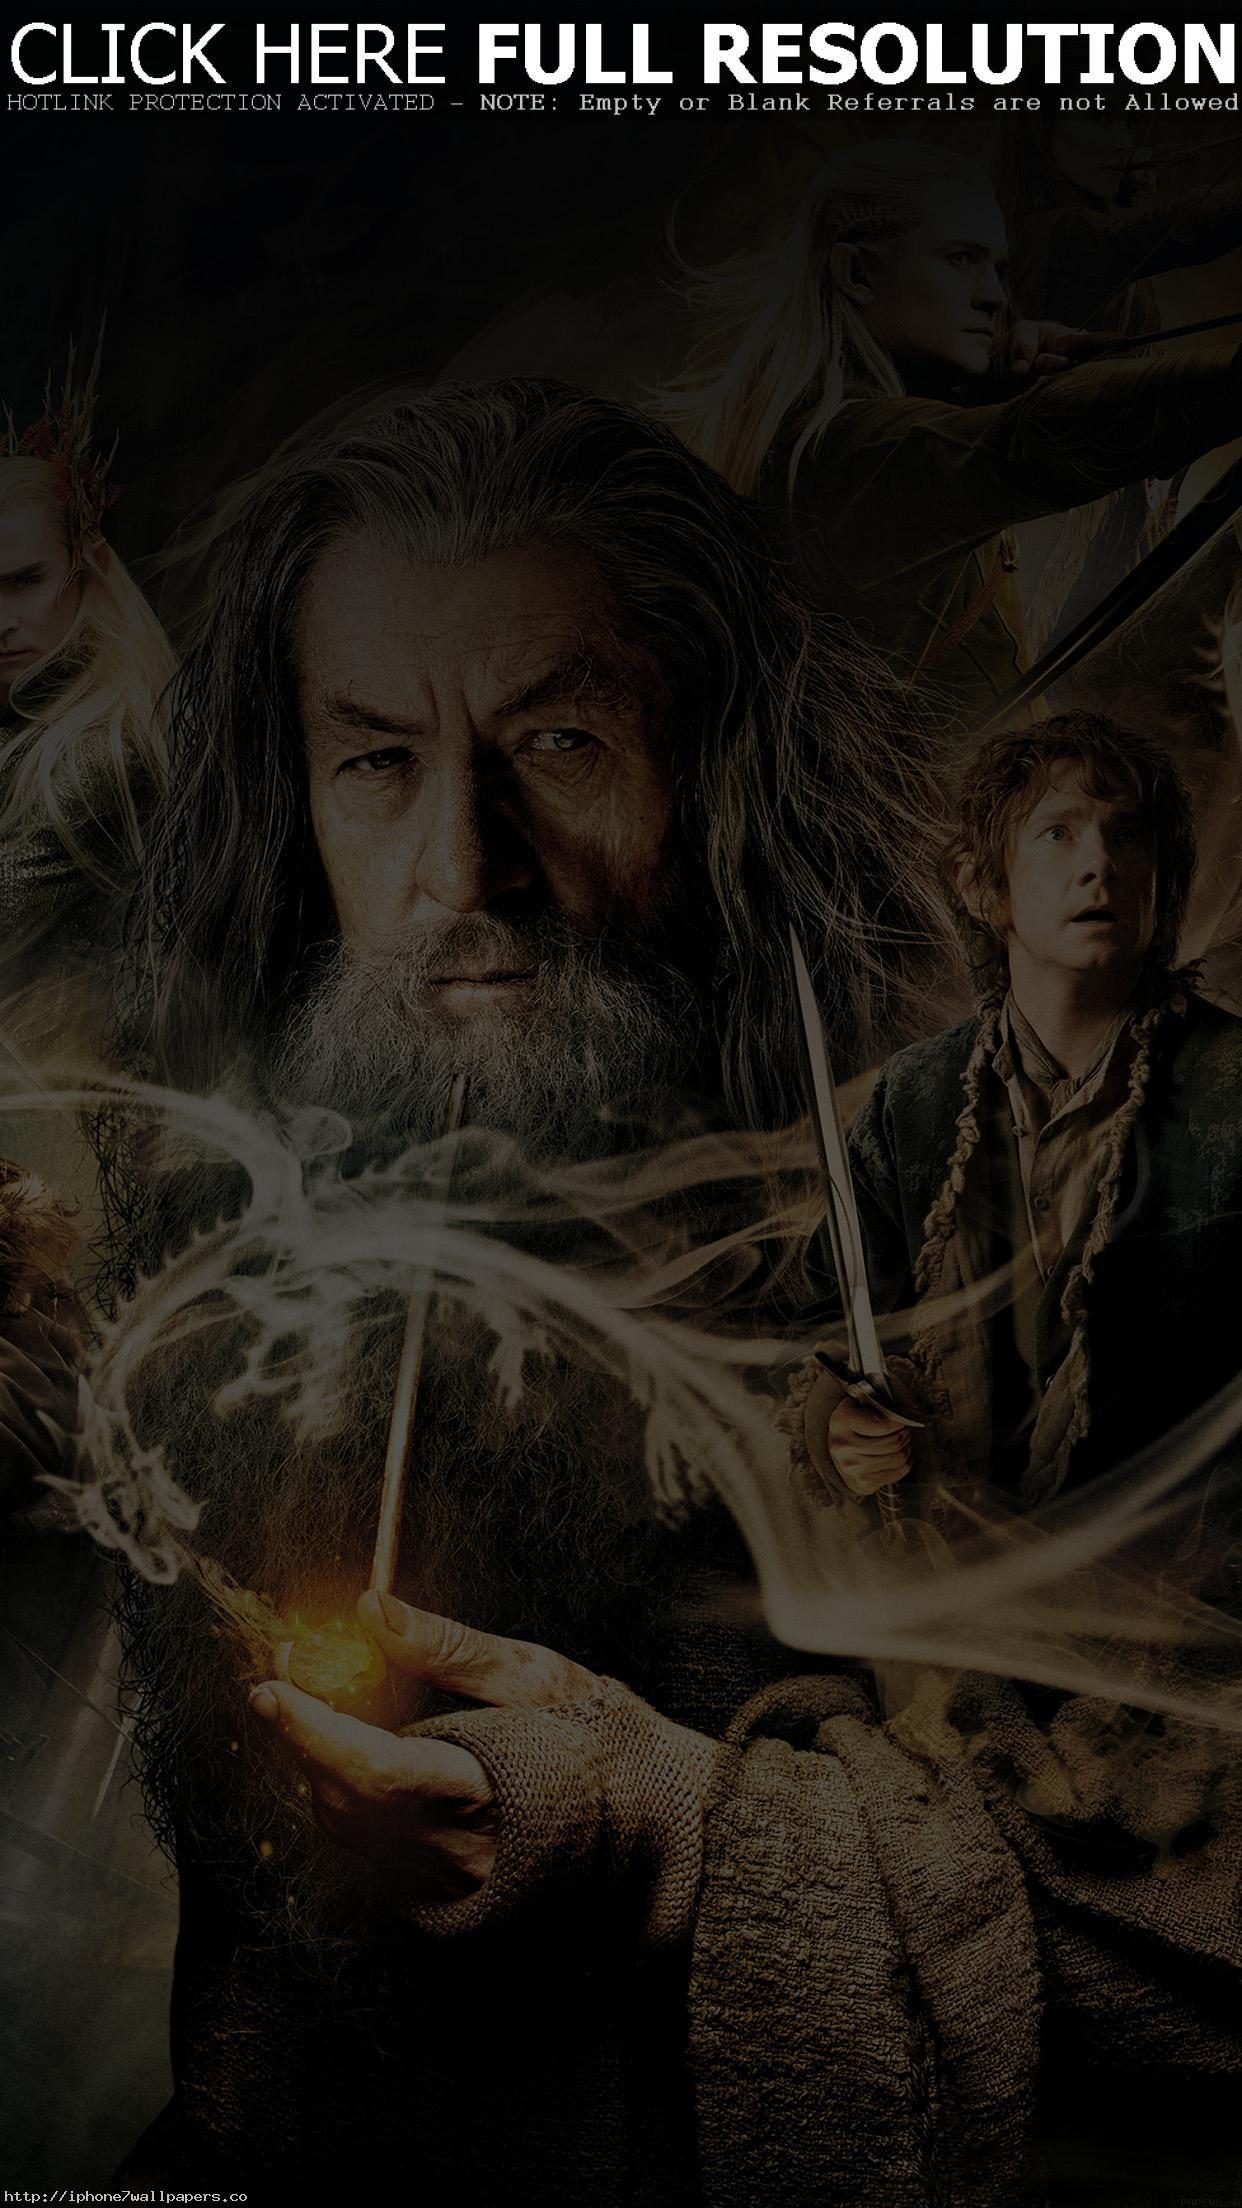 Wallpaper Desolation Of Smaug Hobbit Film Face Android wallpaper – Android HD  wallpapers